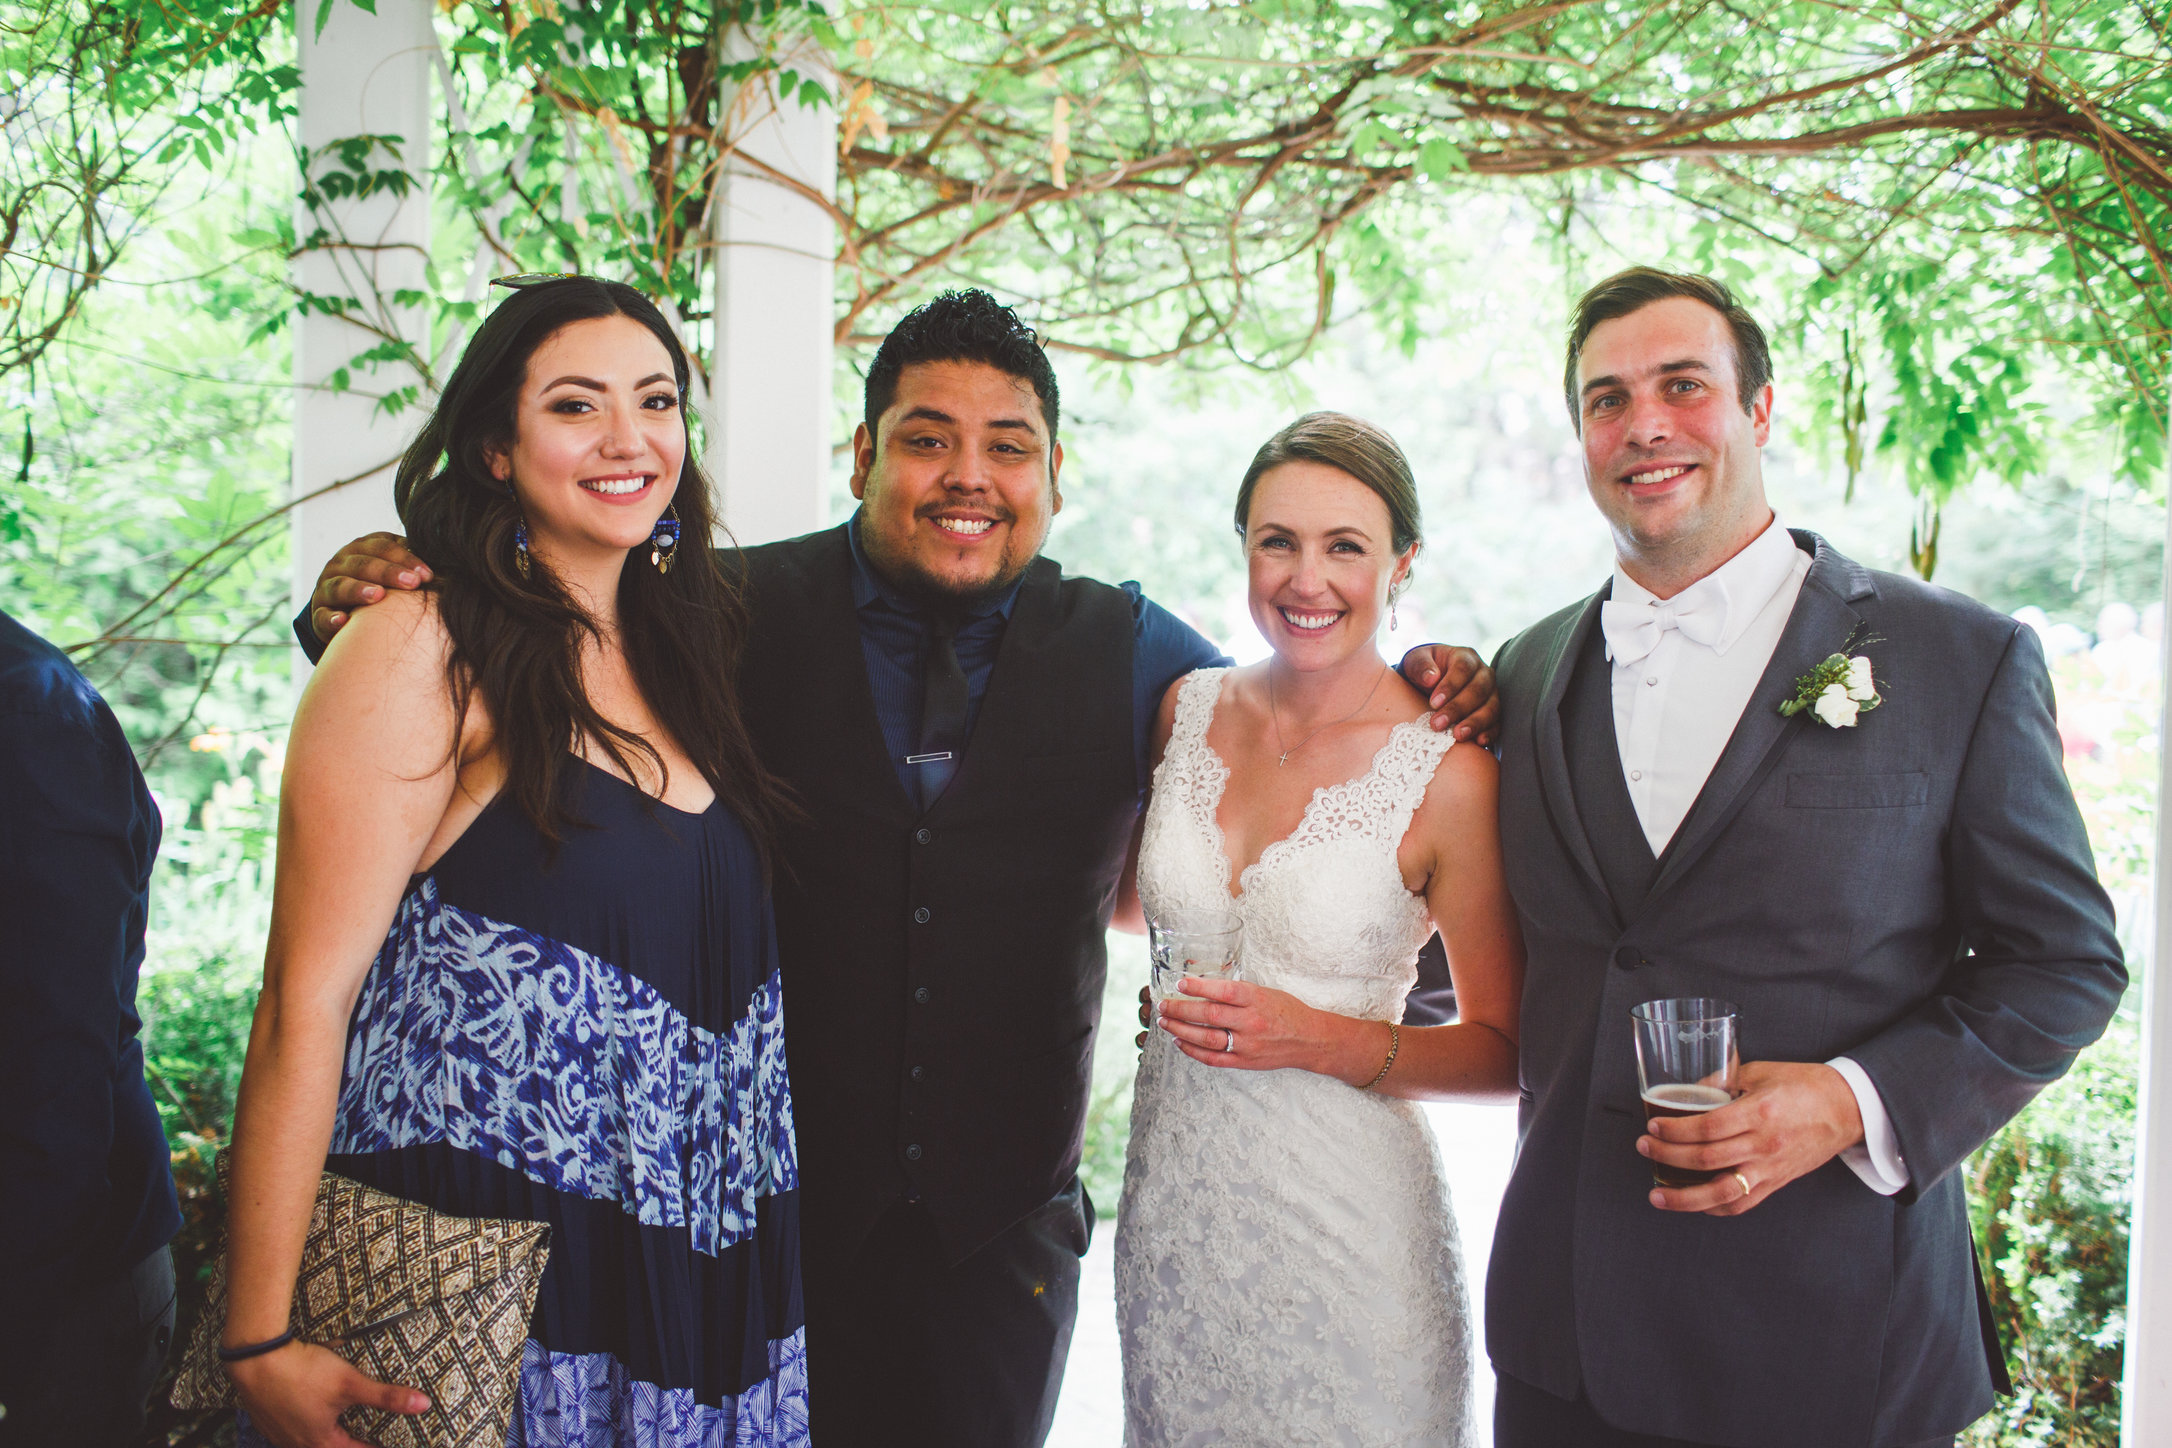 SandC-wedding-439.jpg